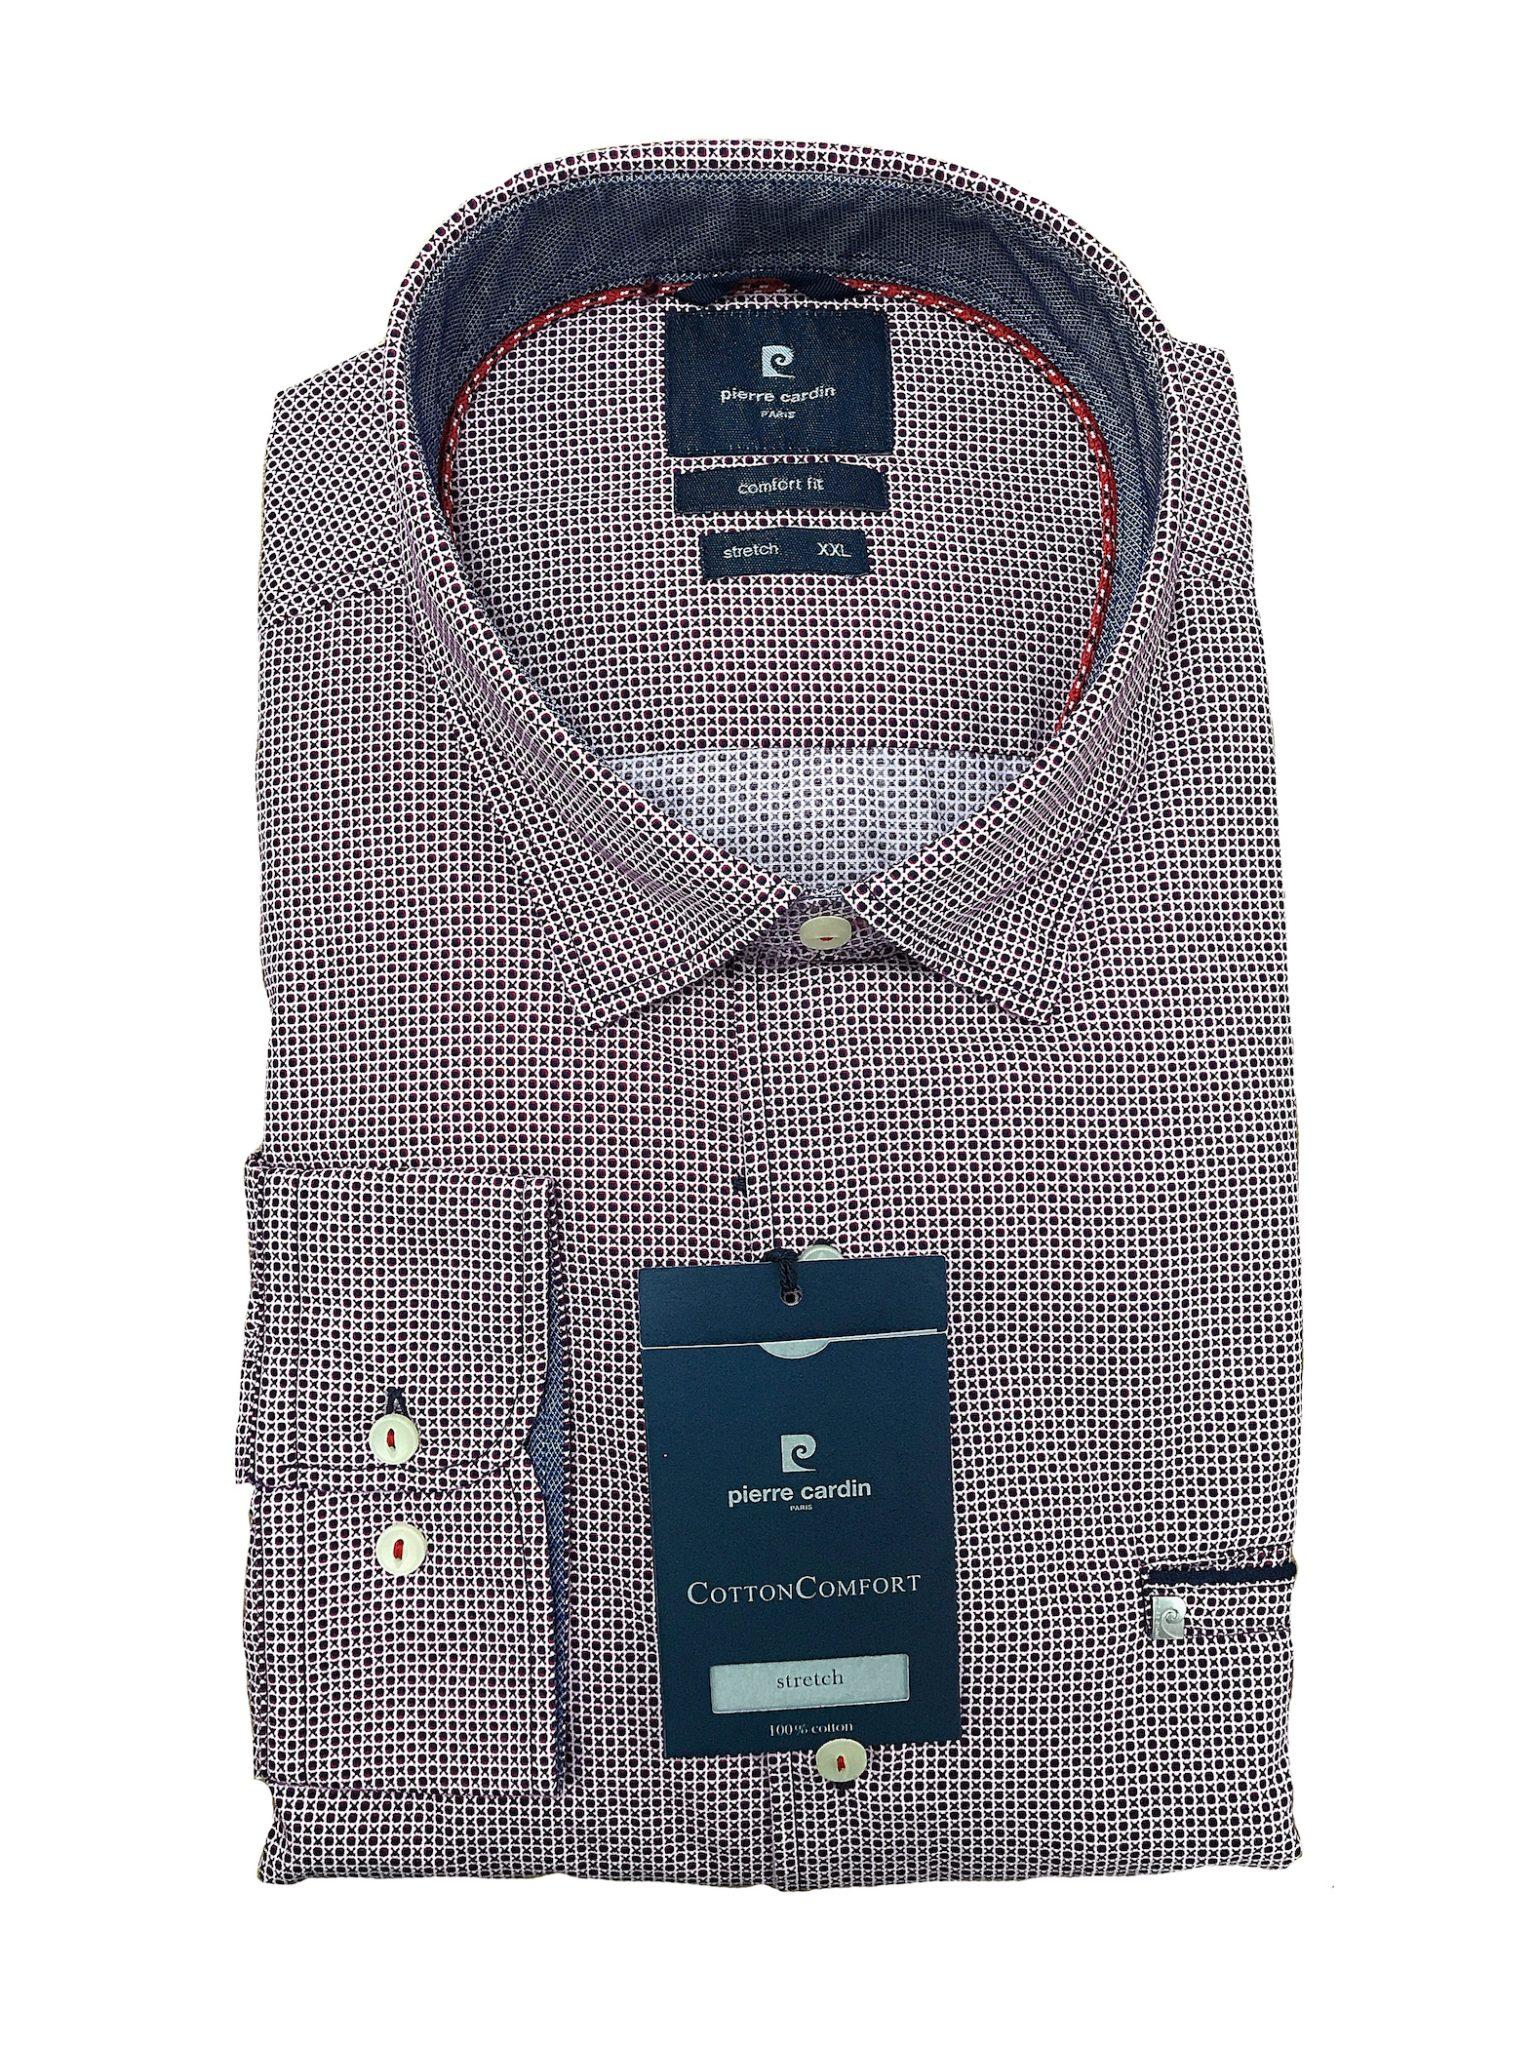 Overhemd Op Maat.Pierre Cardin Overhemd Grote Maat Donkerrood Fantasie Motiefje Stretch